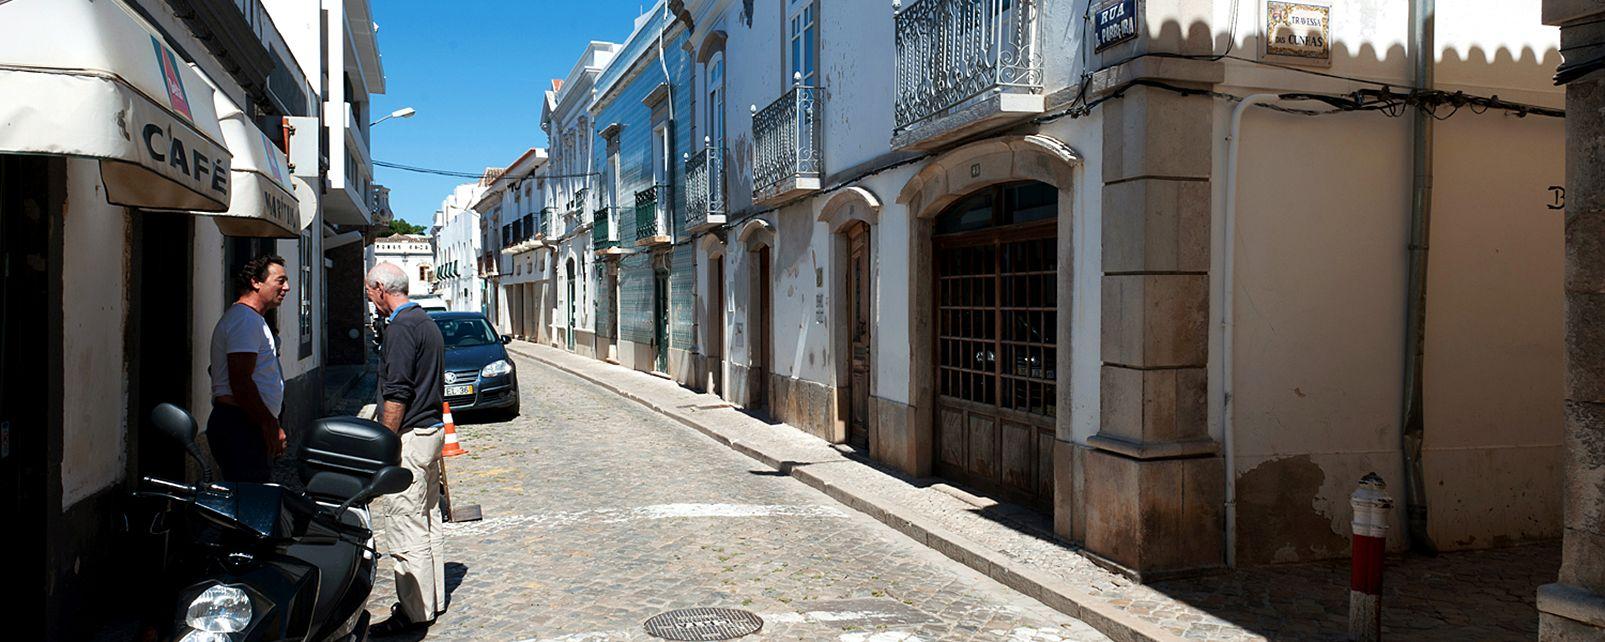 Hotel Casa Beleza do Sul